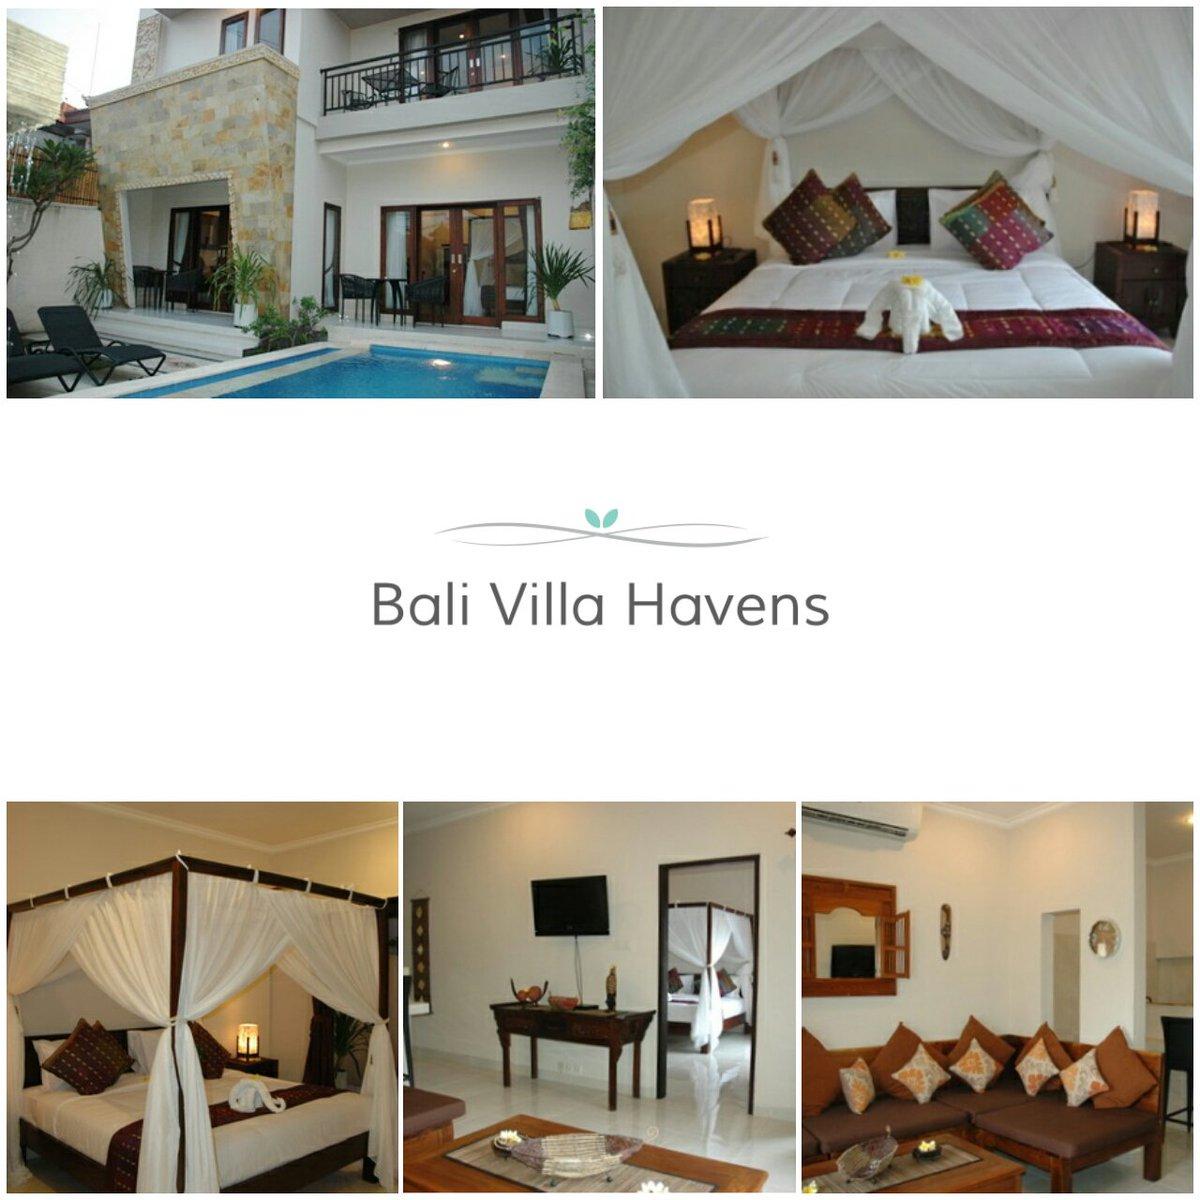 Bali Villa Havens on Twitter: